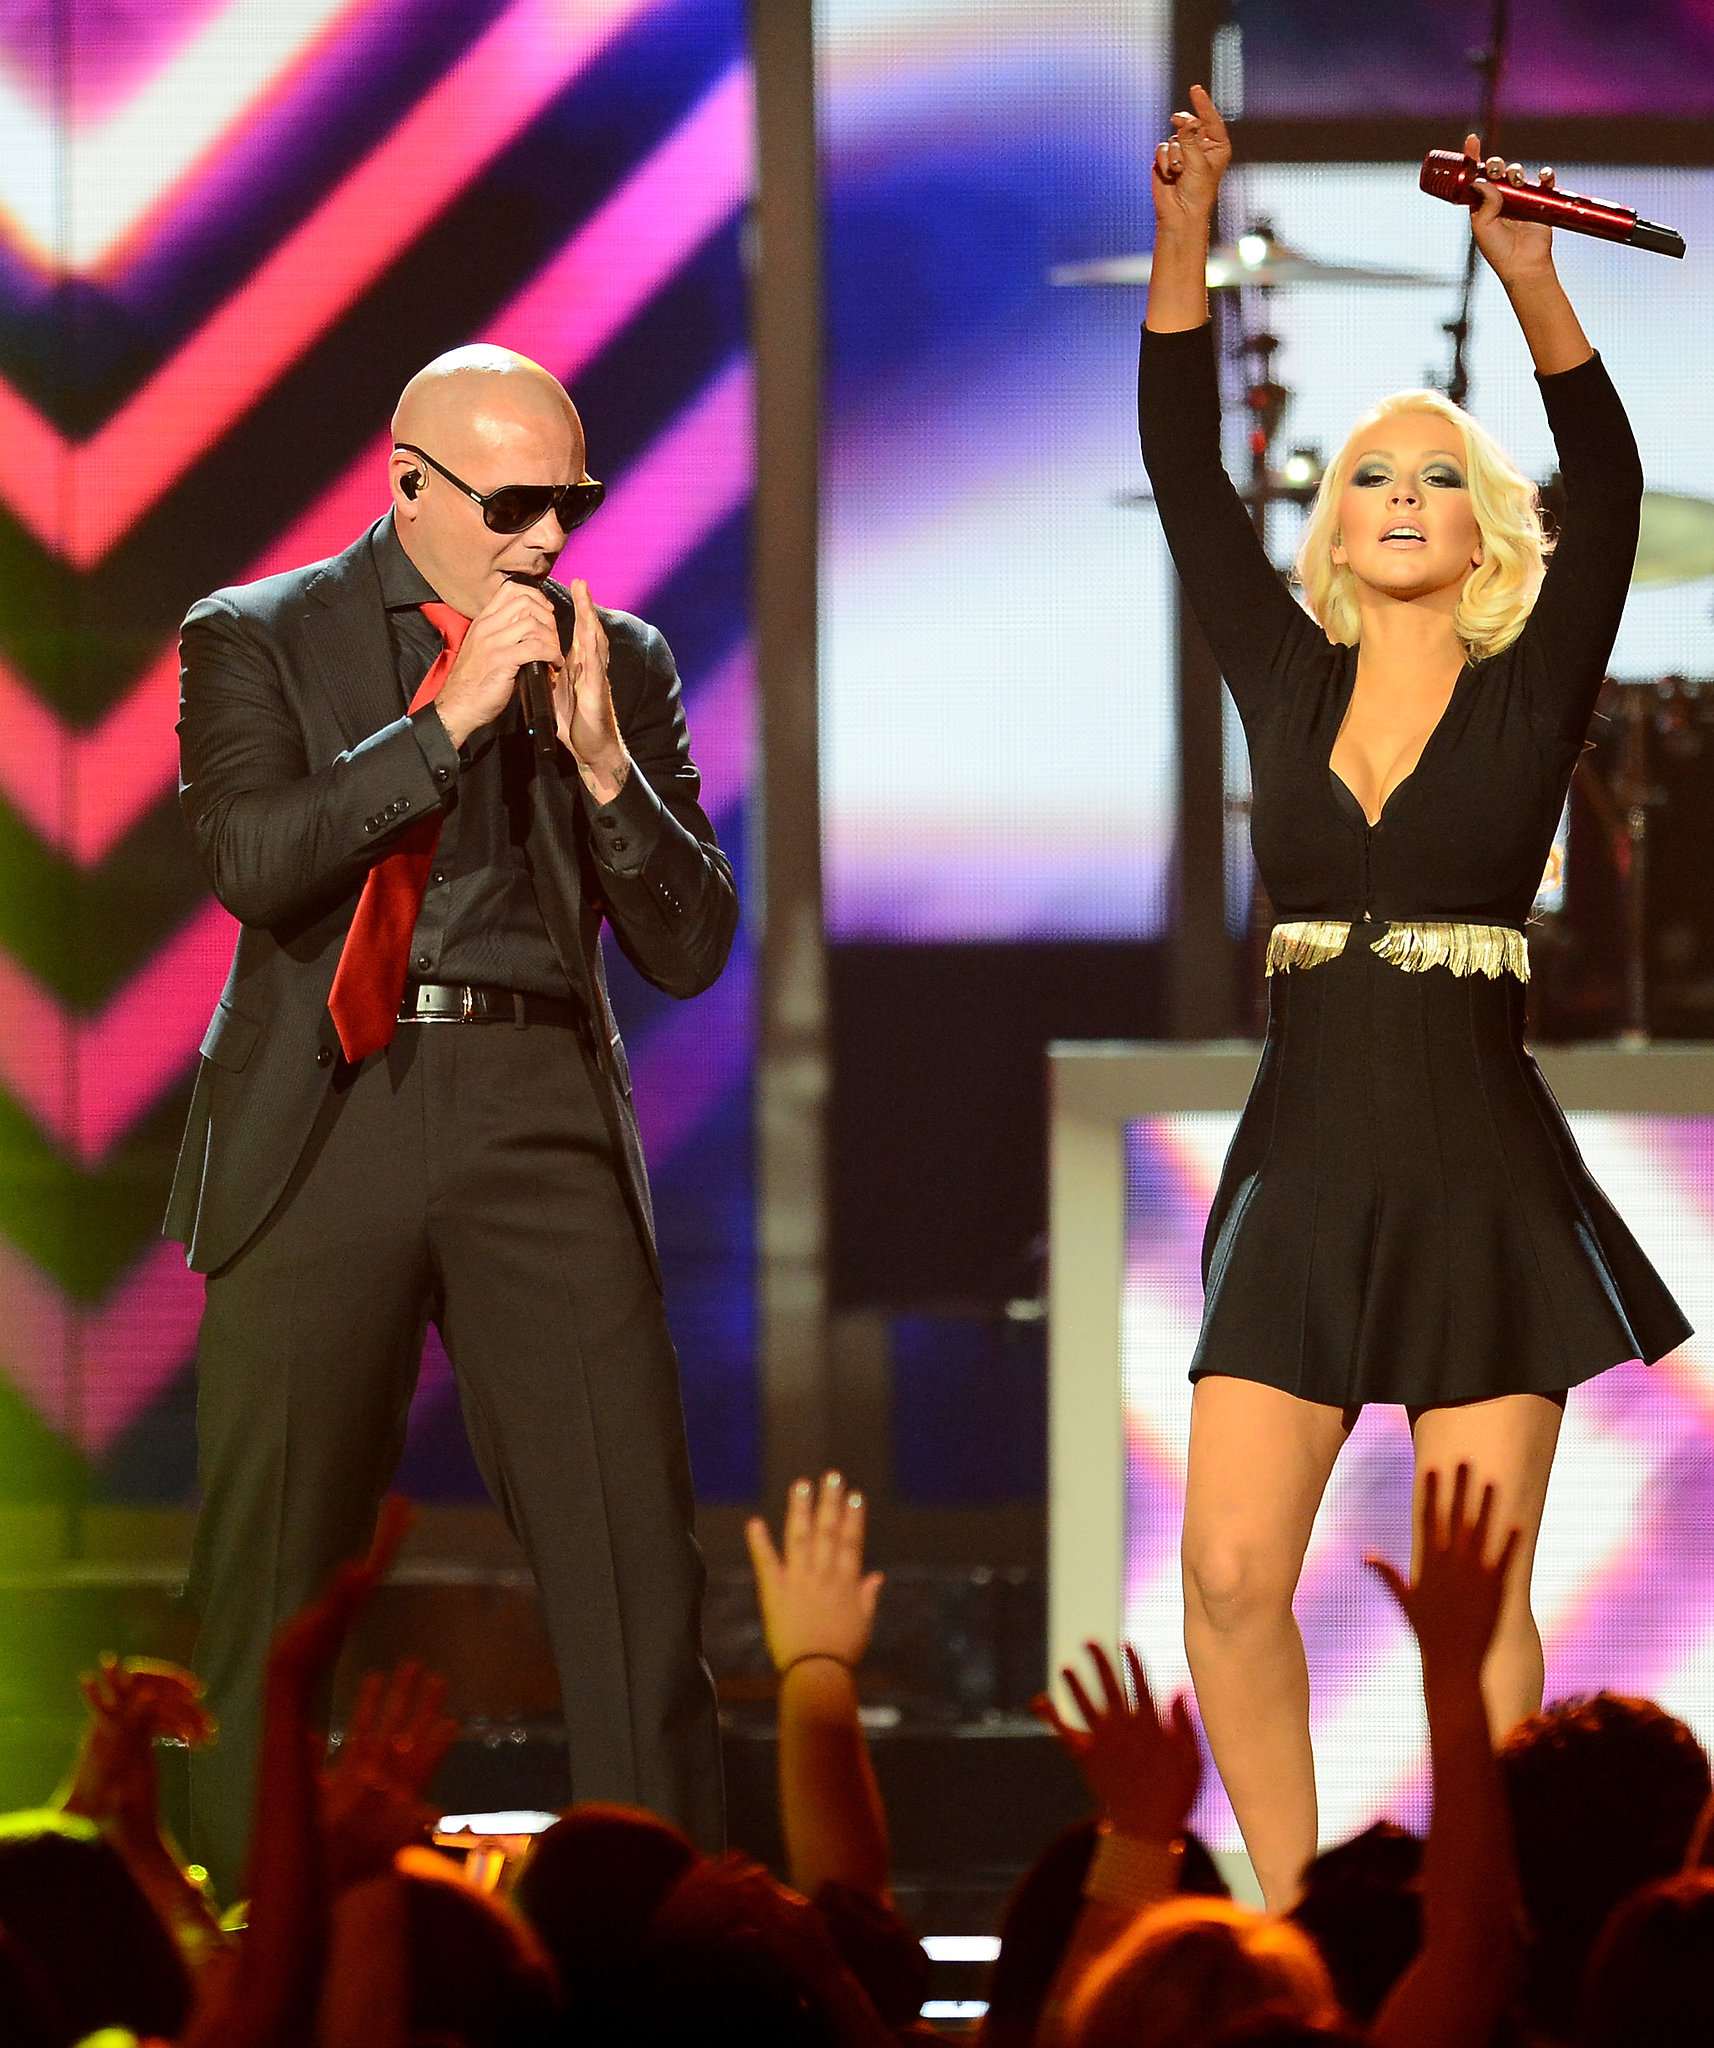 Pitbull and Christina Aguilera shared the sta